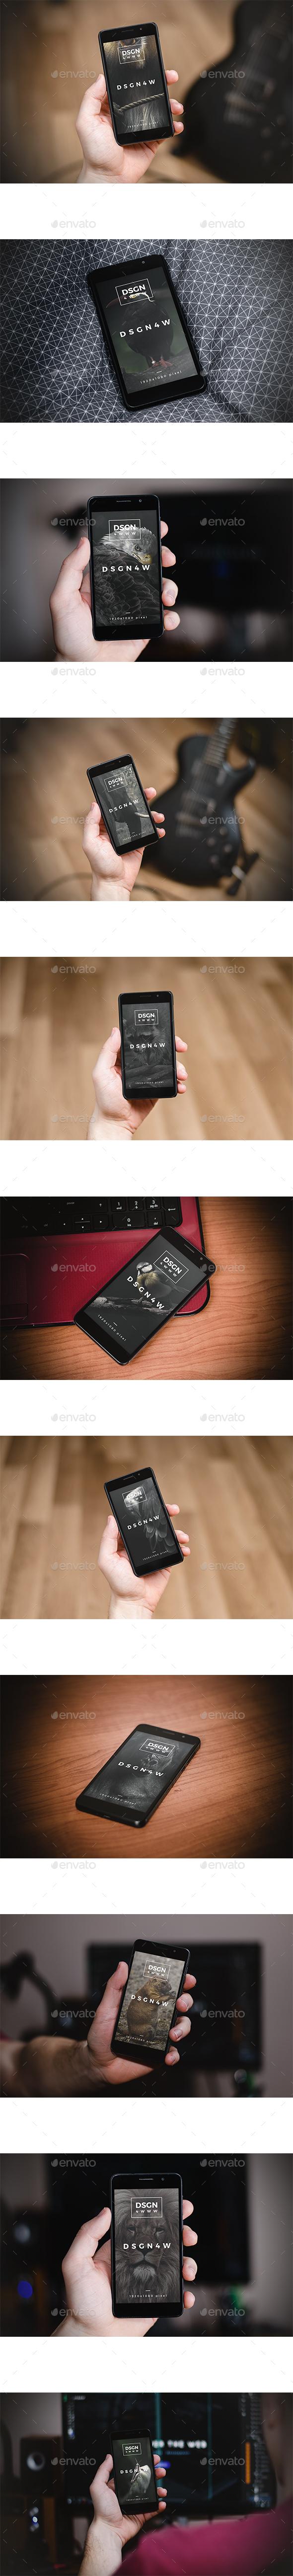 Honor - Smartphone Display Mockup  - Mobile Displays